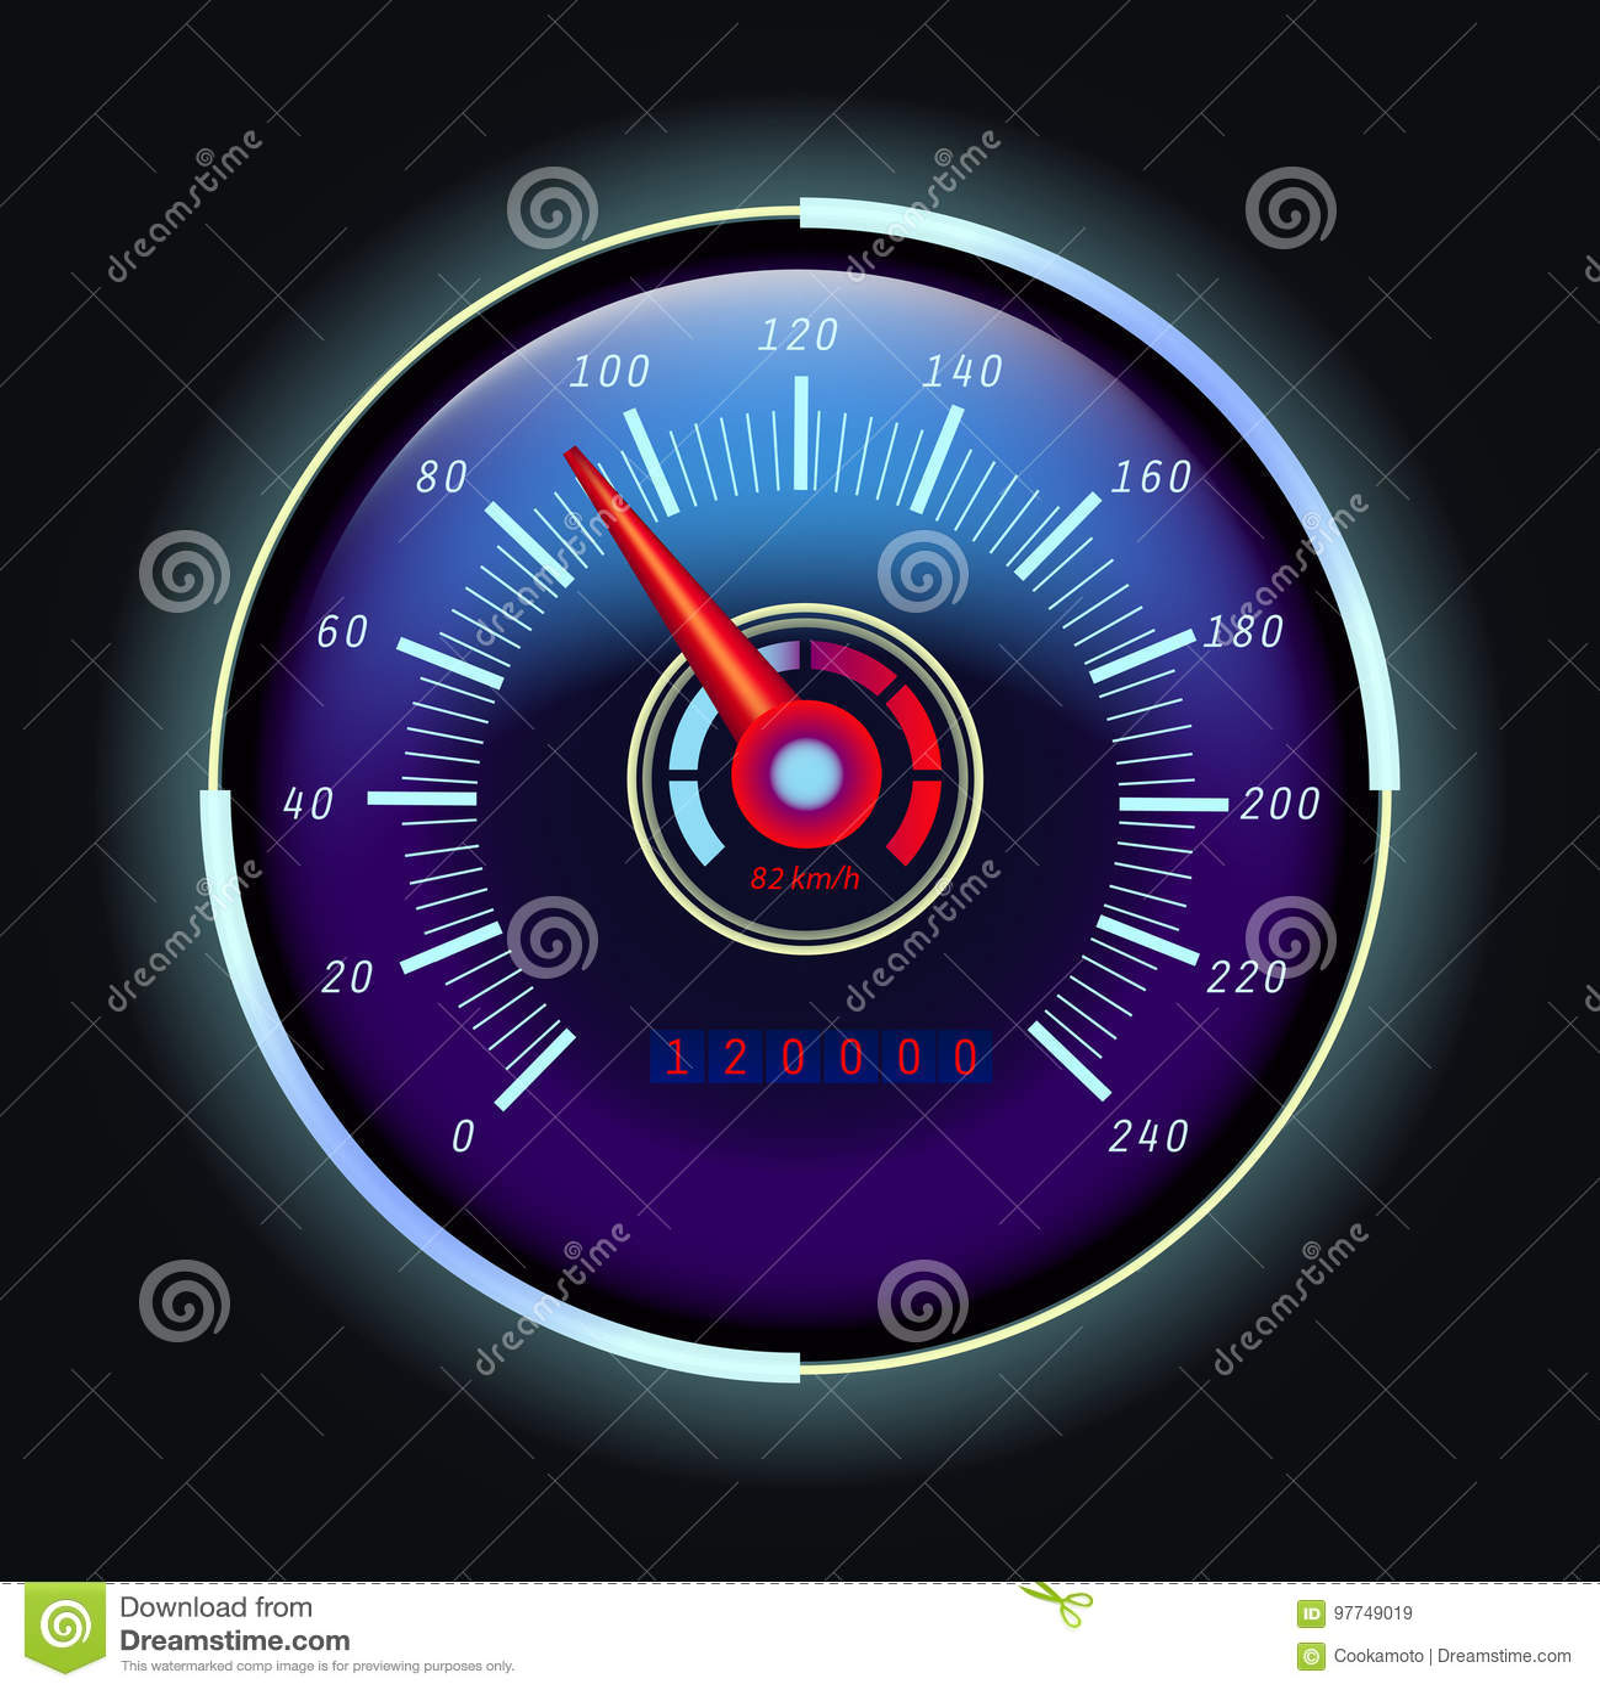 Digital Odometer And Analog Speedometer With Arrow Stock